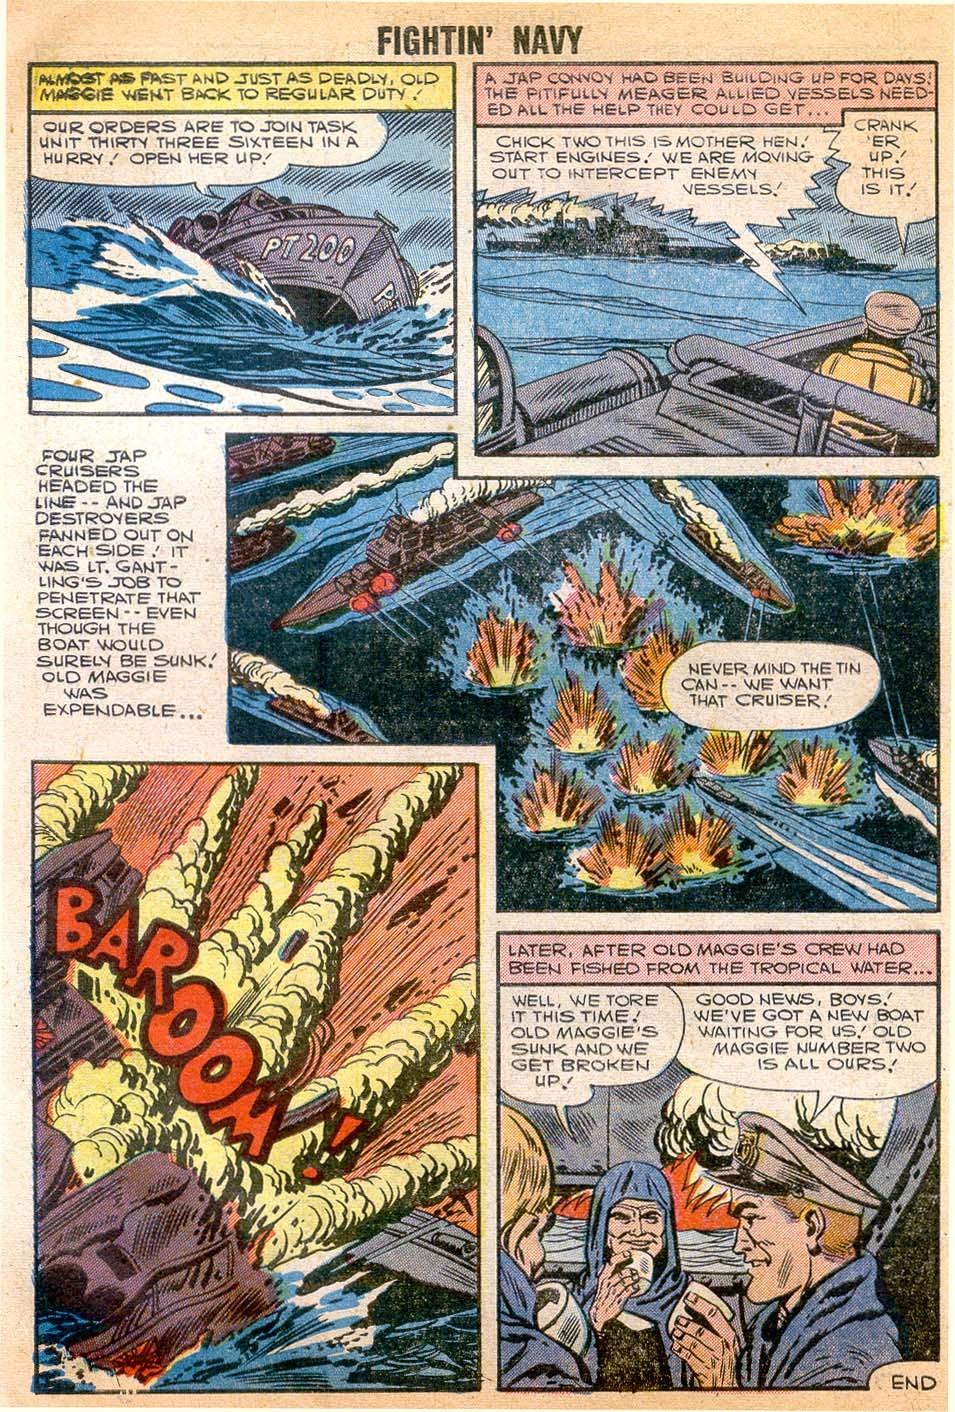 Read online Fightin' Navy comic -  Issue #79 - 10